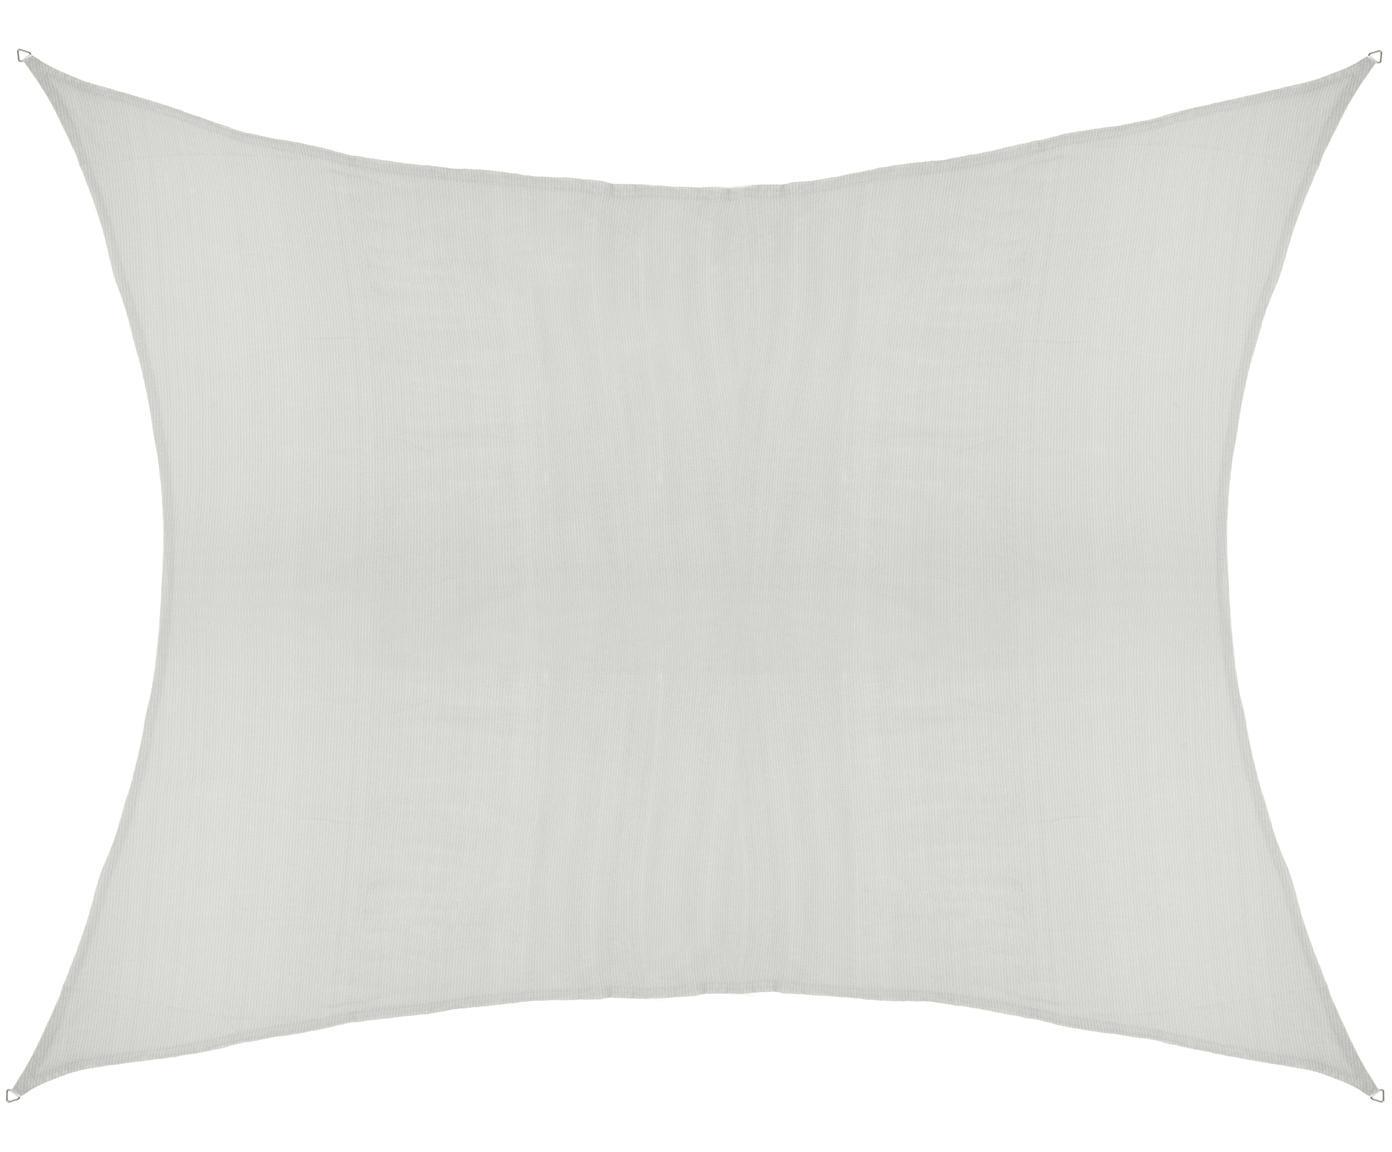 Markiza Hope, Biały, S 350 x D 500 cm